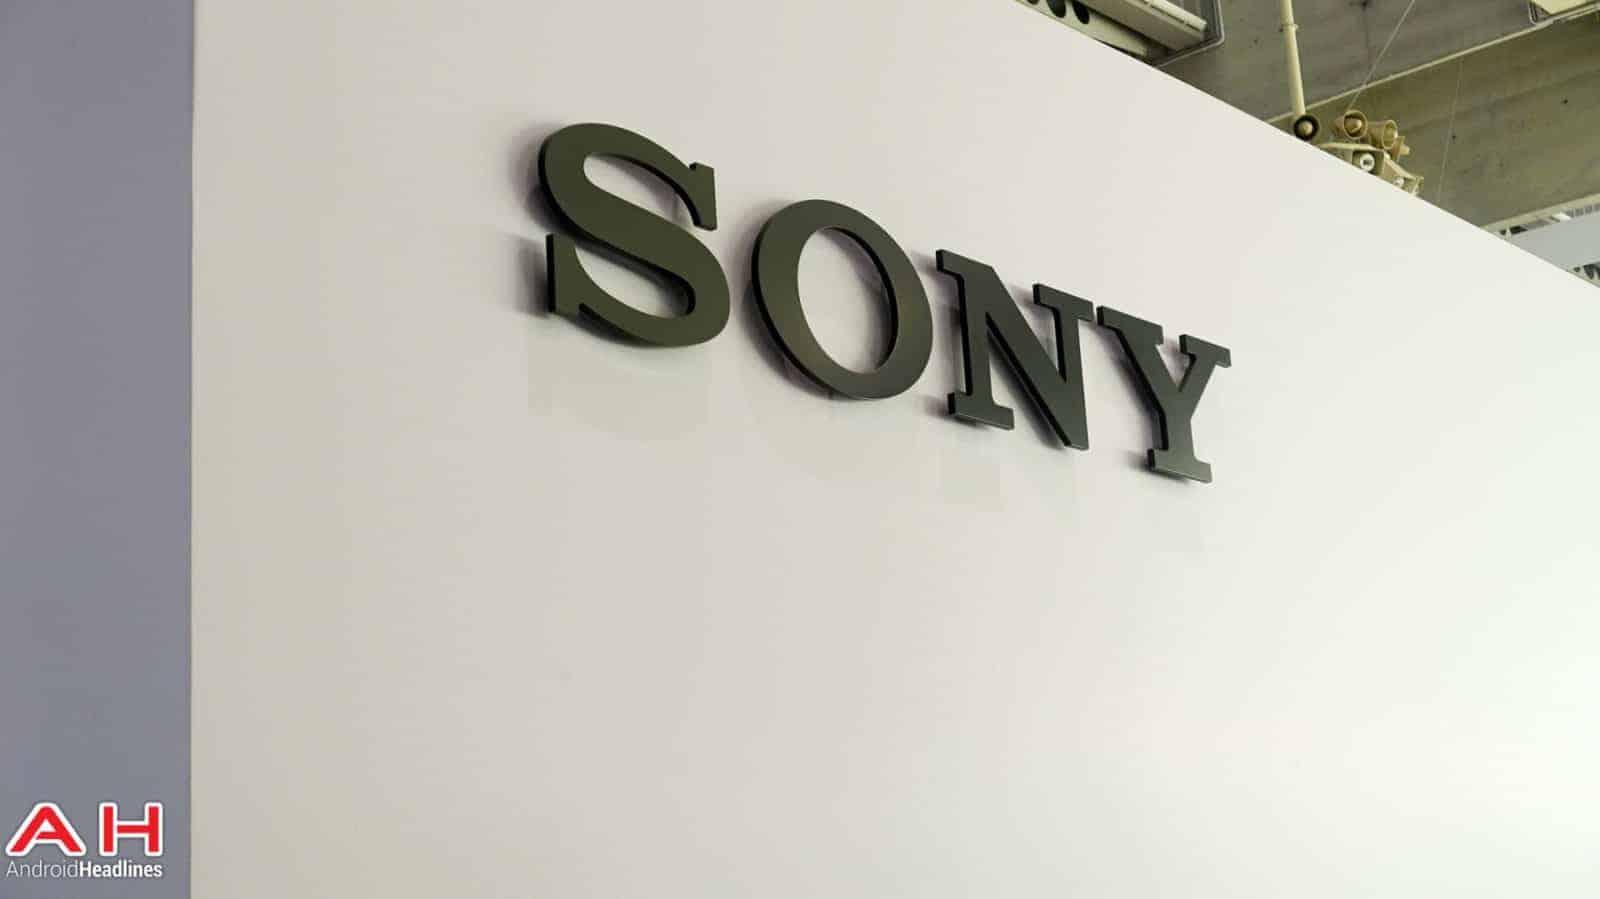 Sony-Logo-AH3